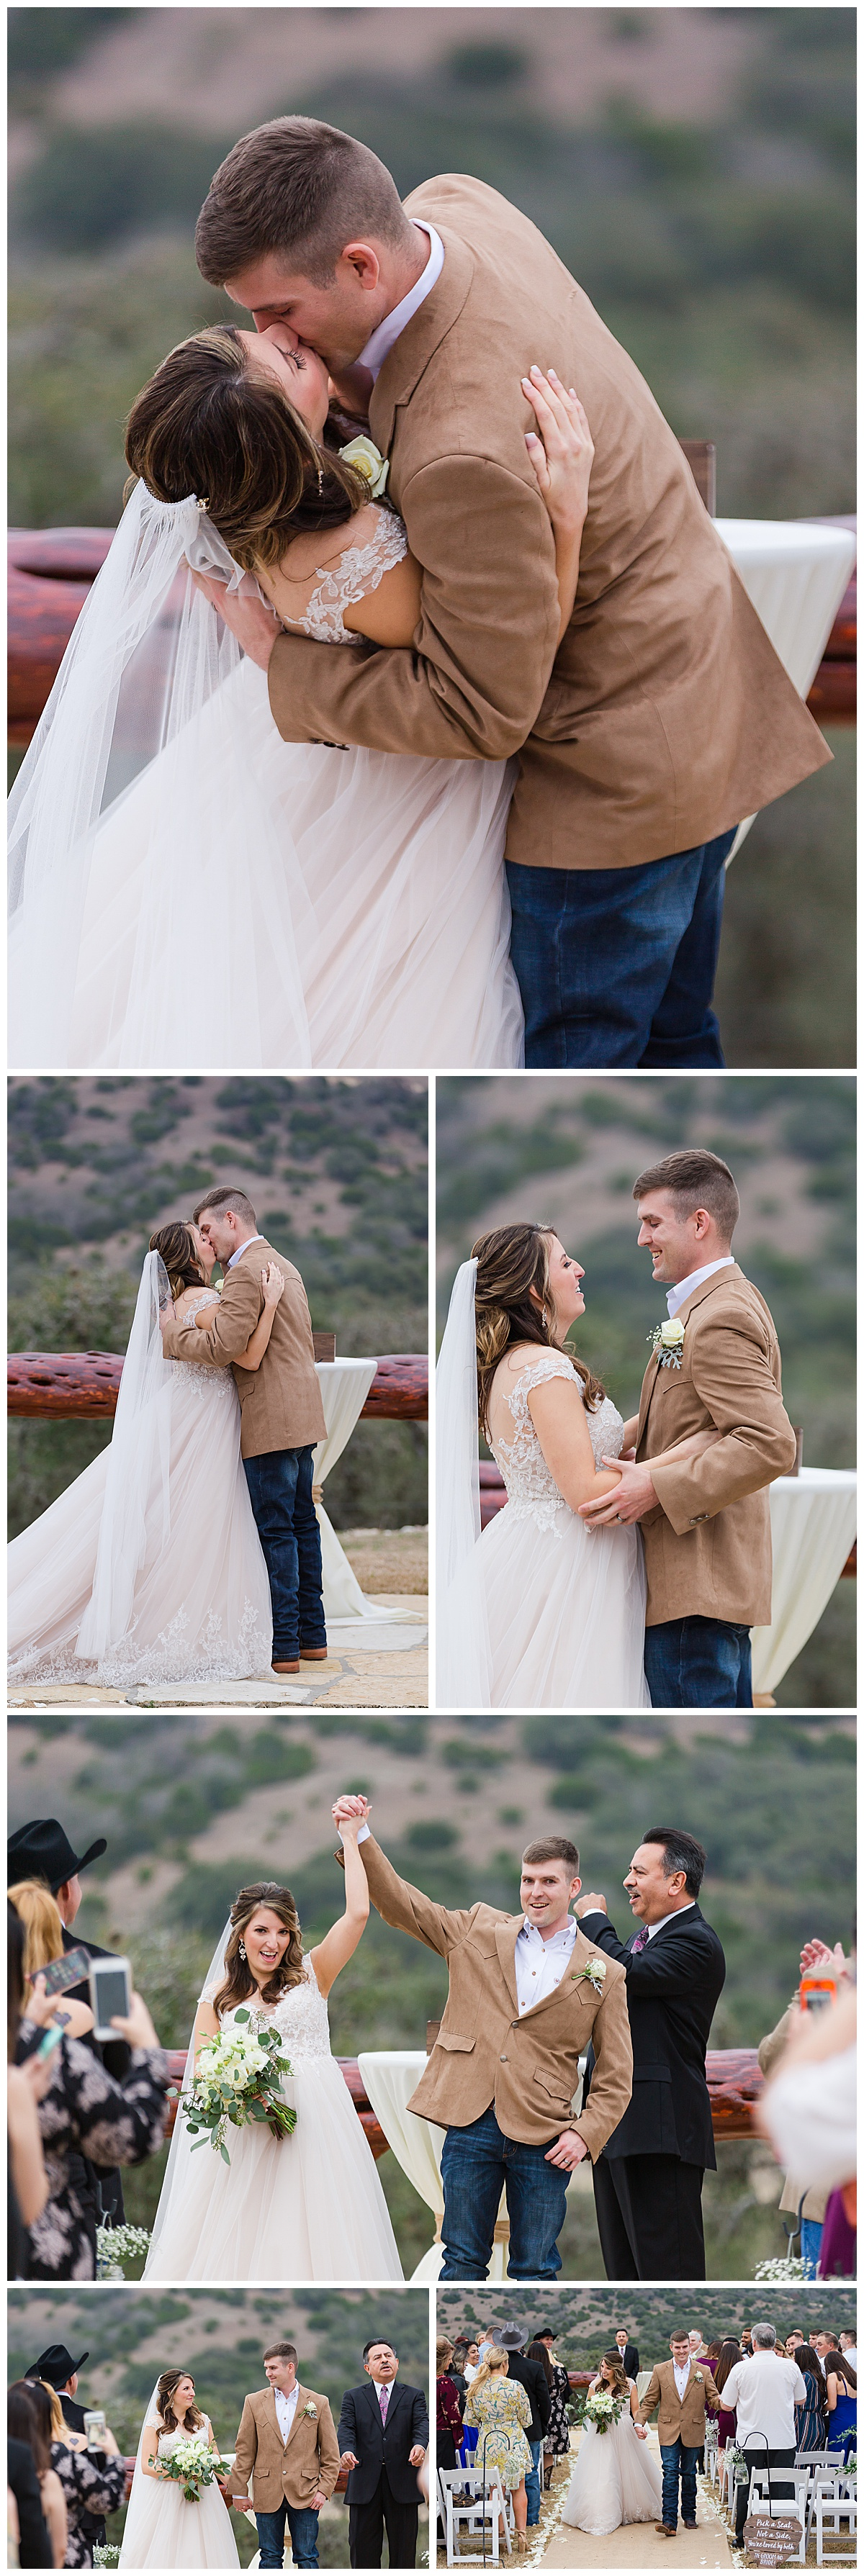 Wedding-Photographer-Texas-Hill-Country-Happy-H-Ranch-Comfor-Texas-Carly-Barton-Photography_0027.jpg